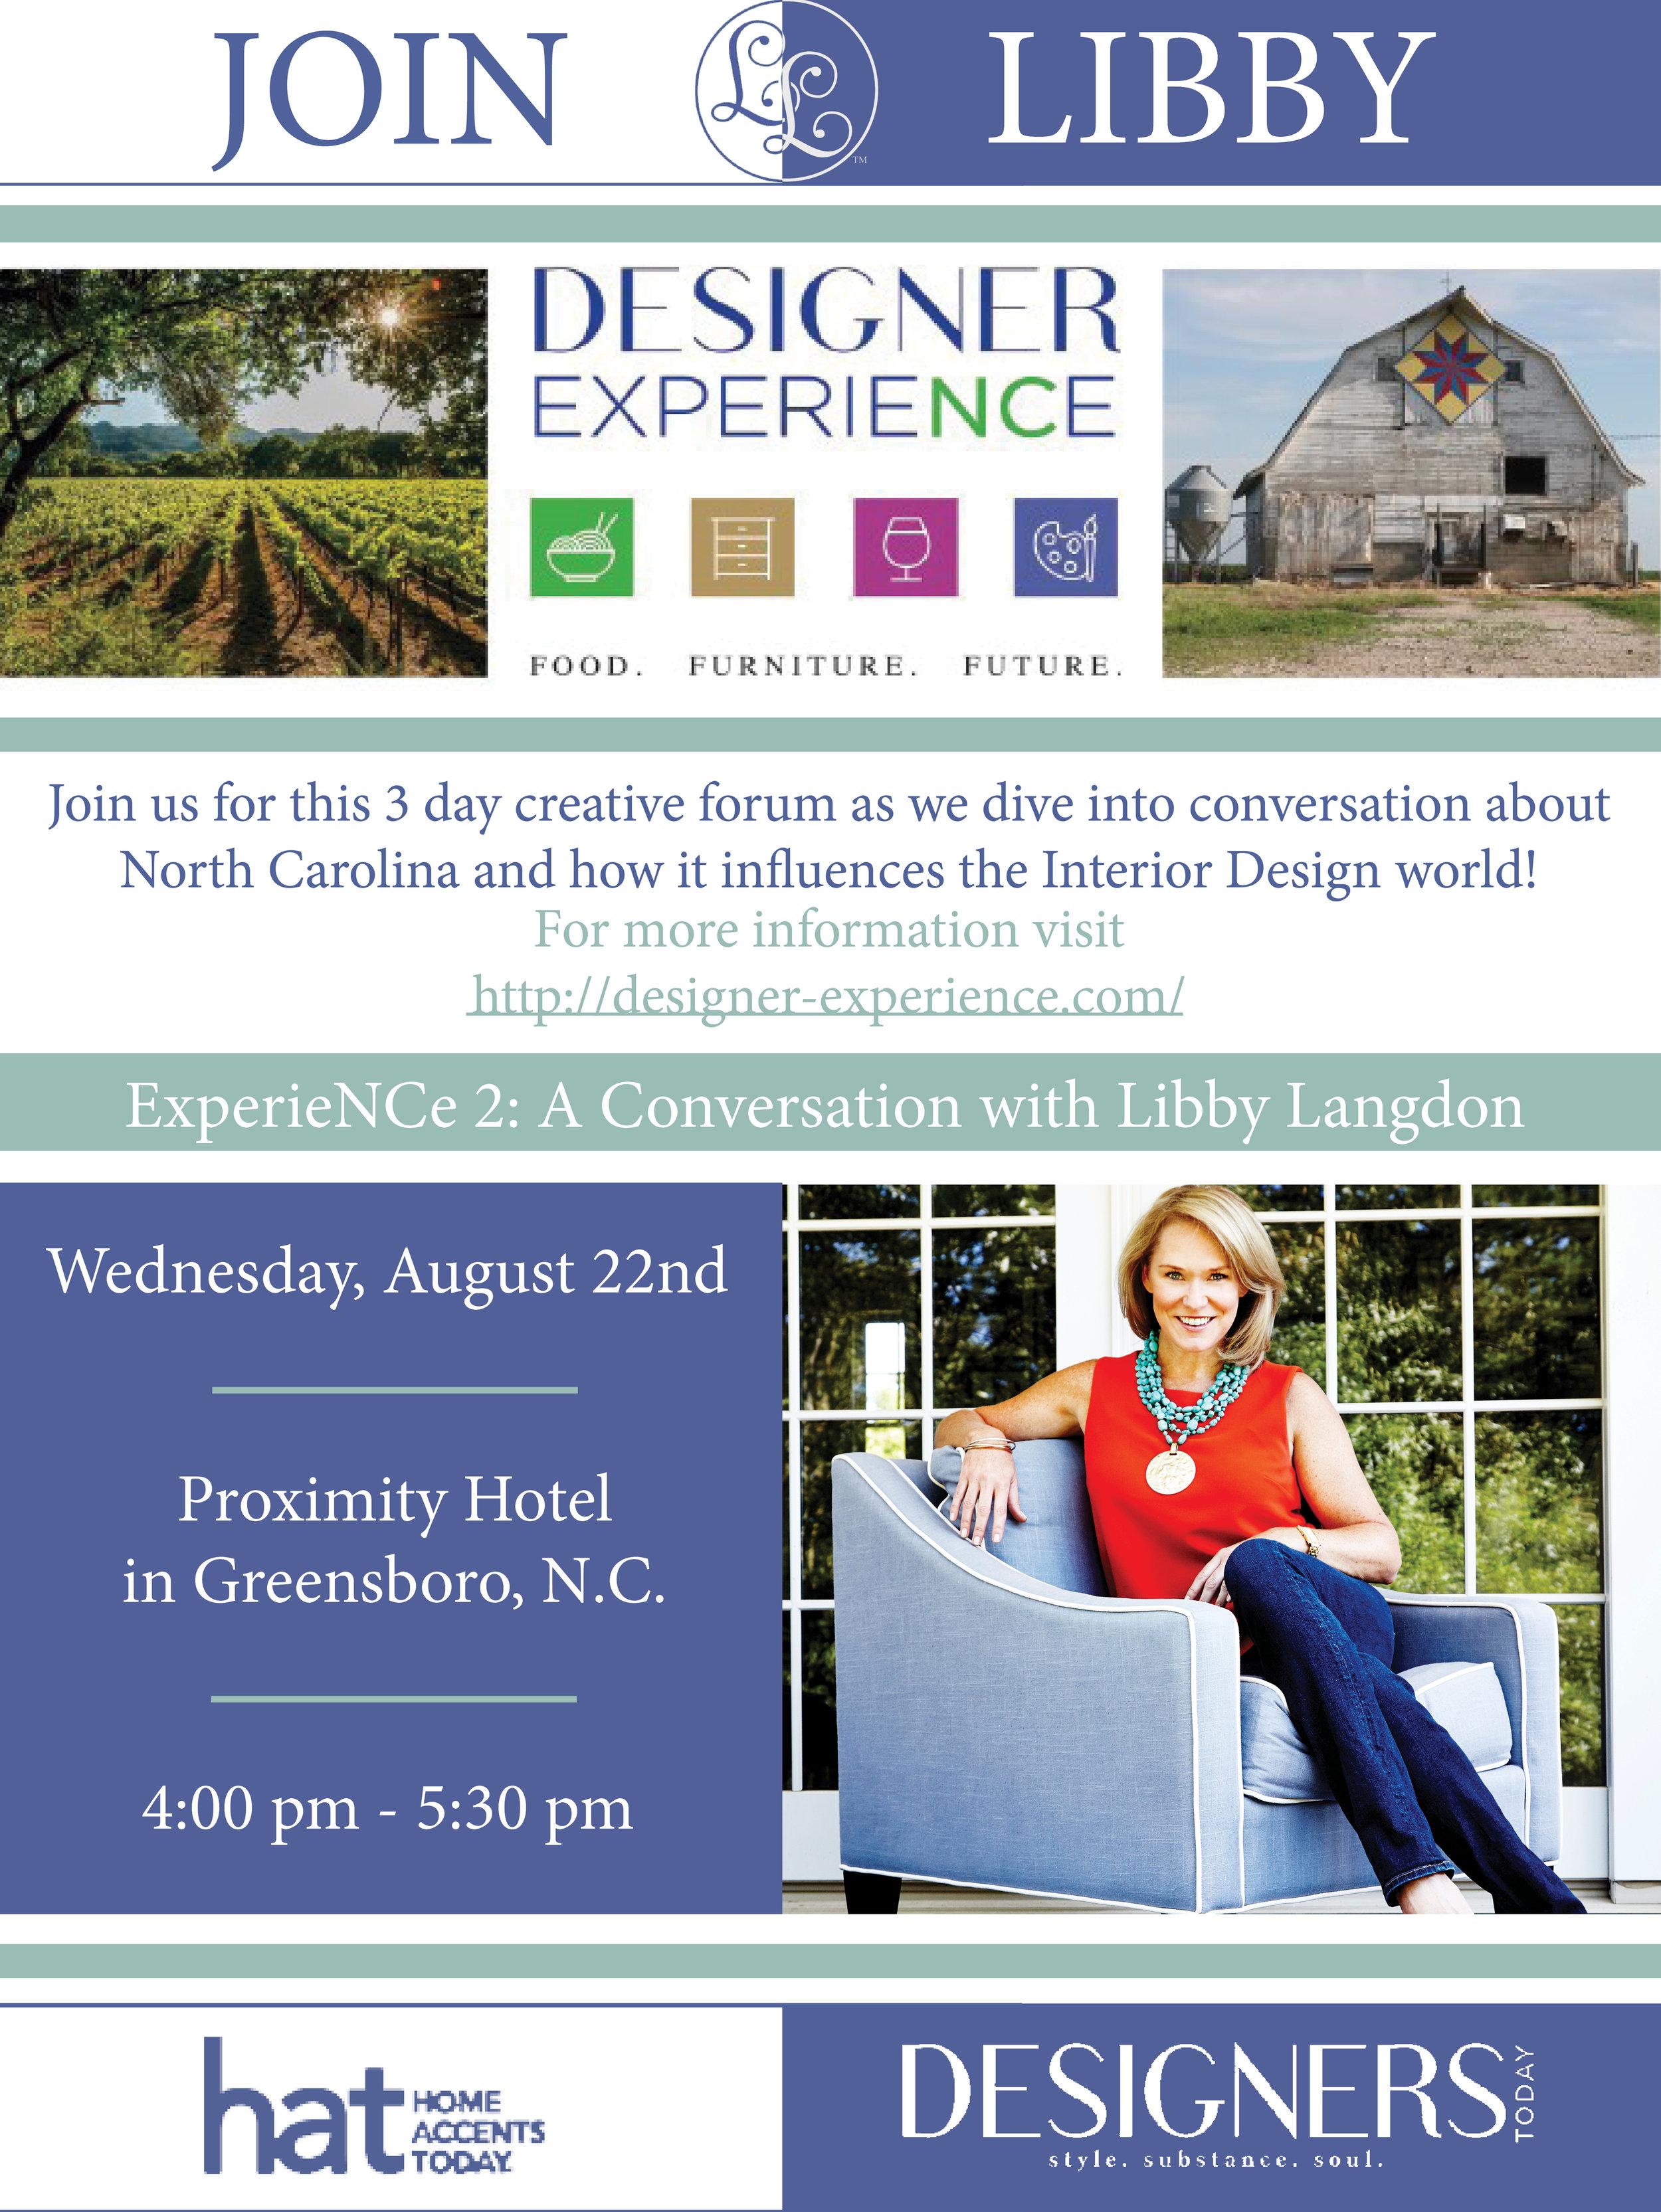 Design Experience Opportunity.jpg